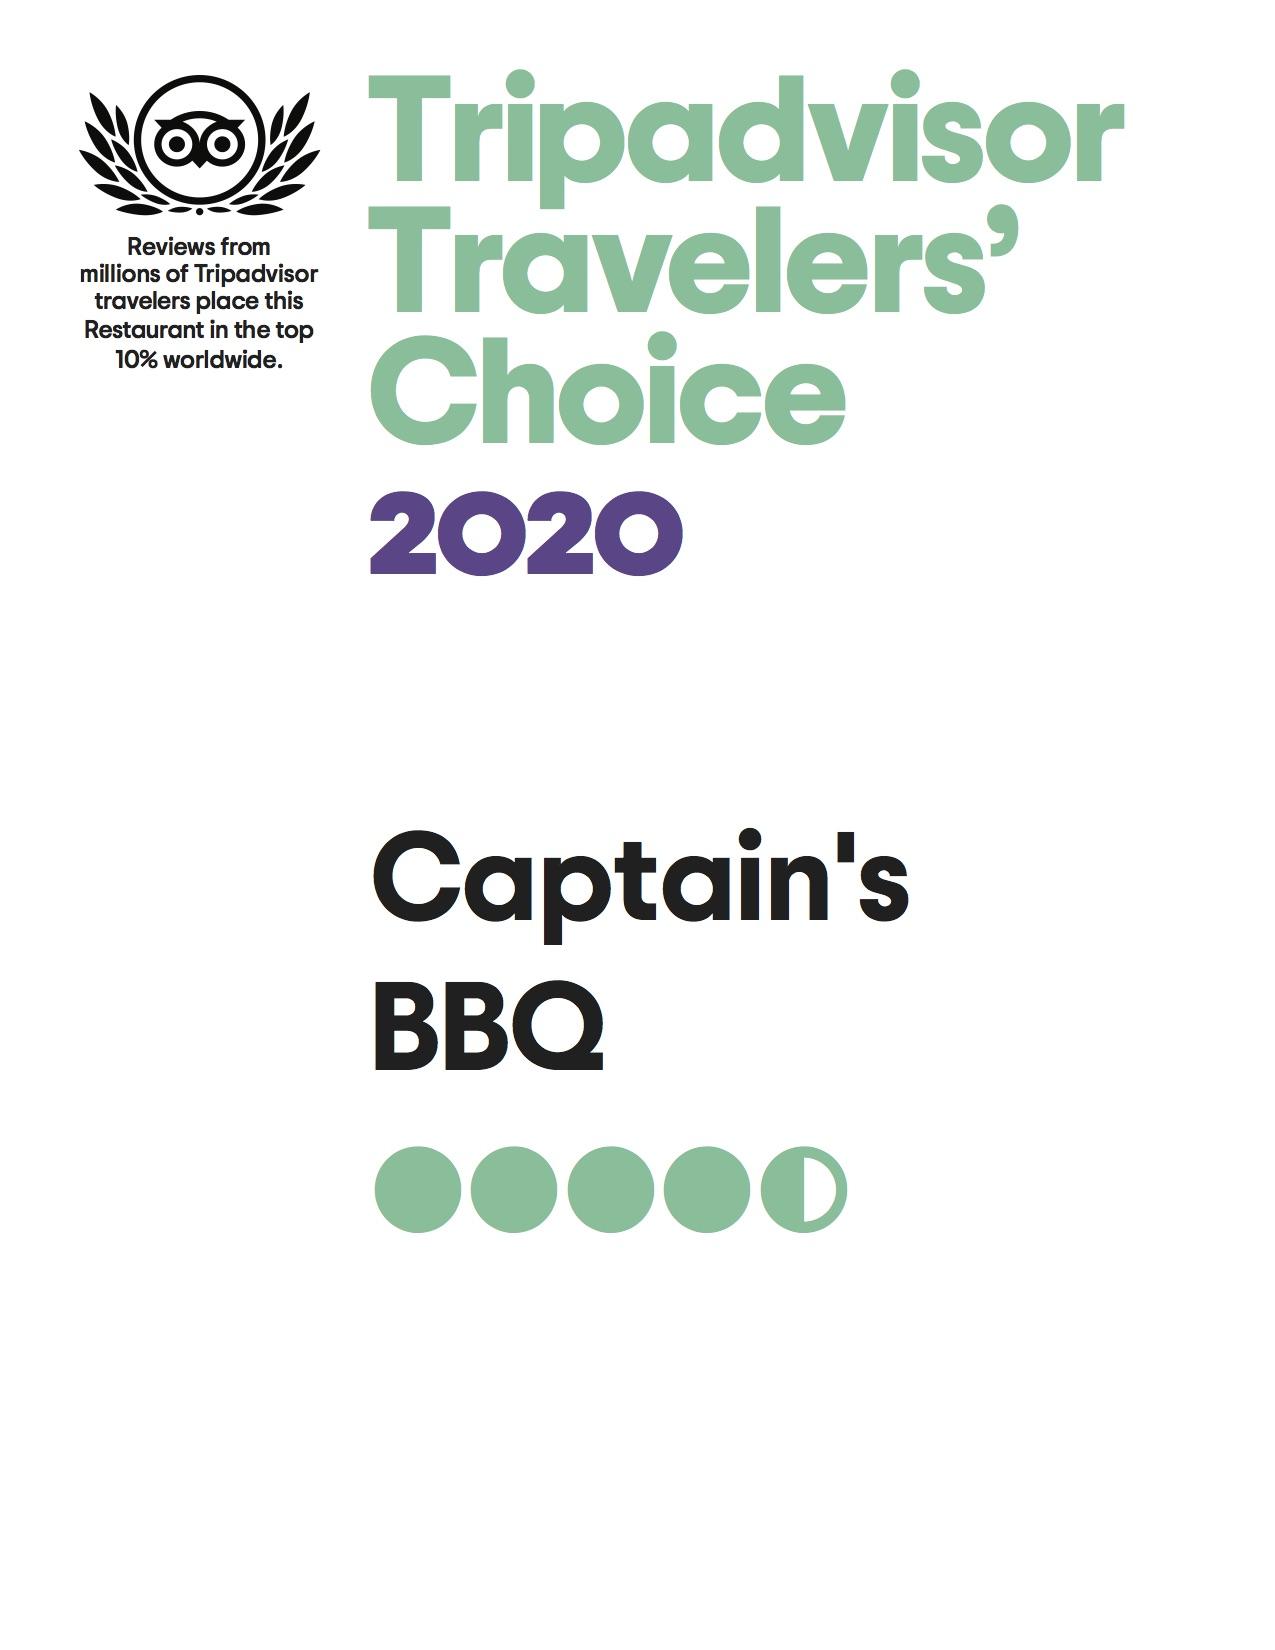 Captain's BBQ Travelers Choice 2020 Award!